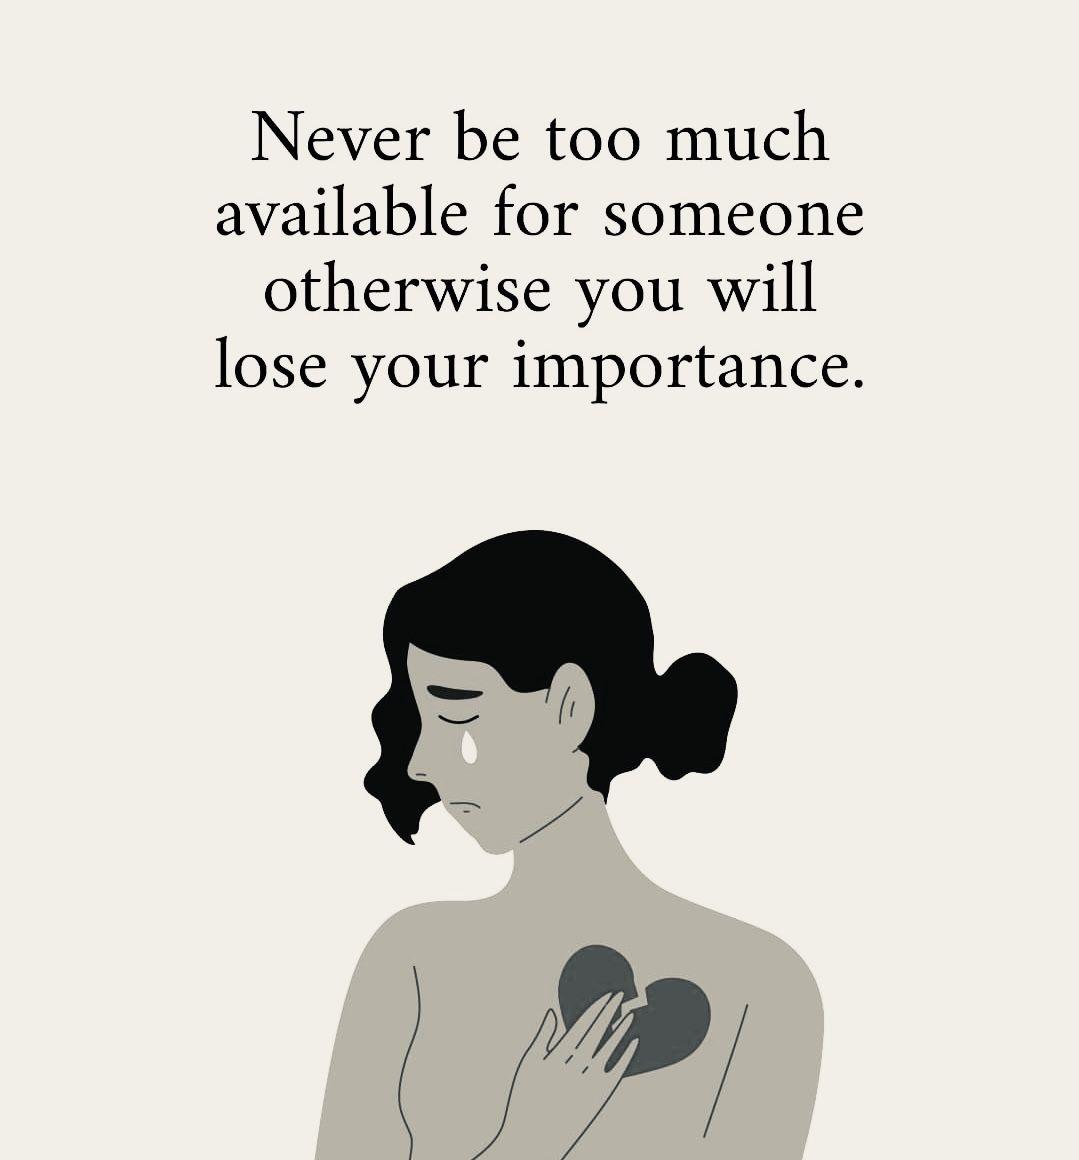 Pin By Manisha K On Relationship Trust Love Life Quotes In 2020 Love Life Quotes Life Quotes Love Life